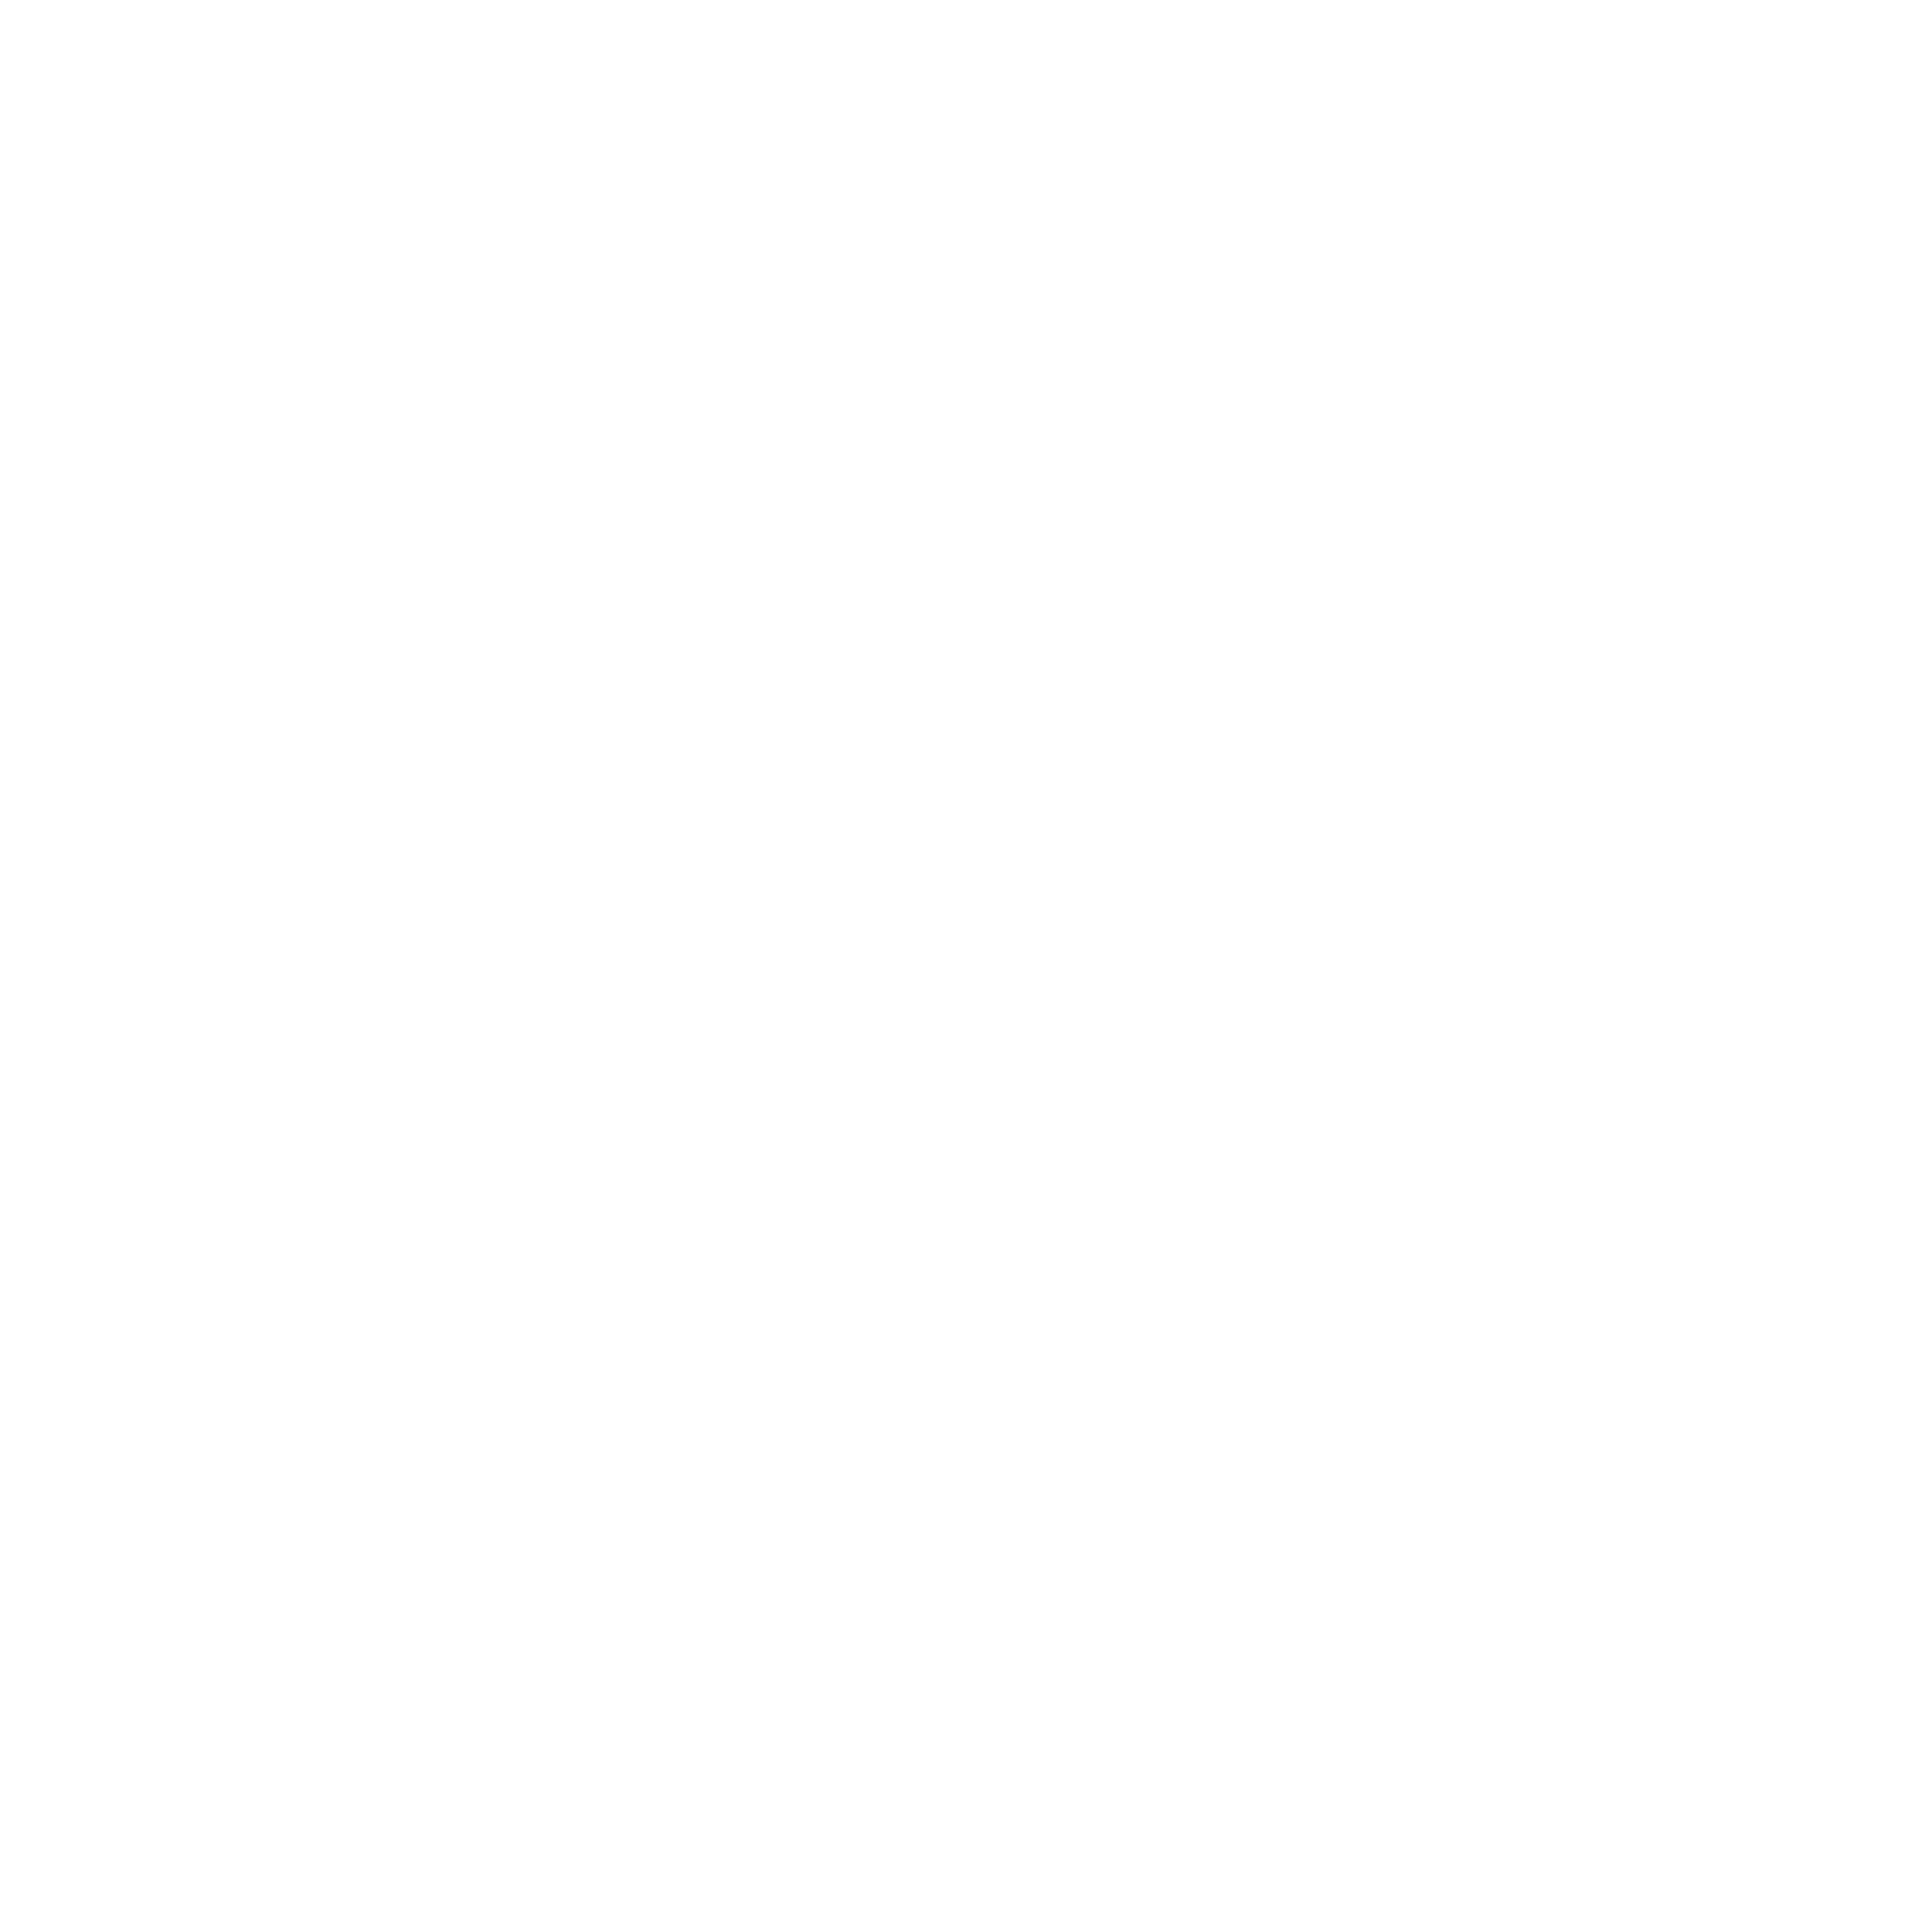 hotelements by paula oblen